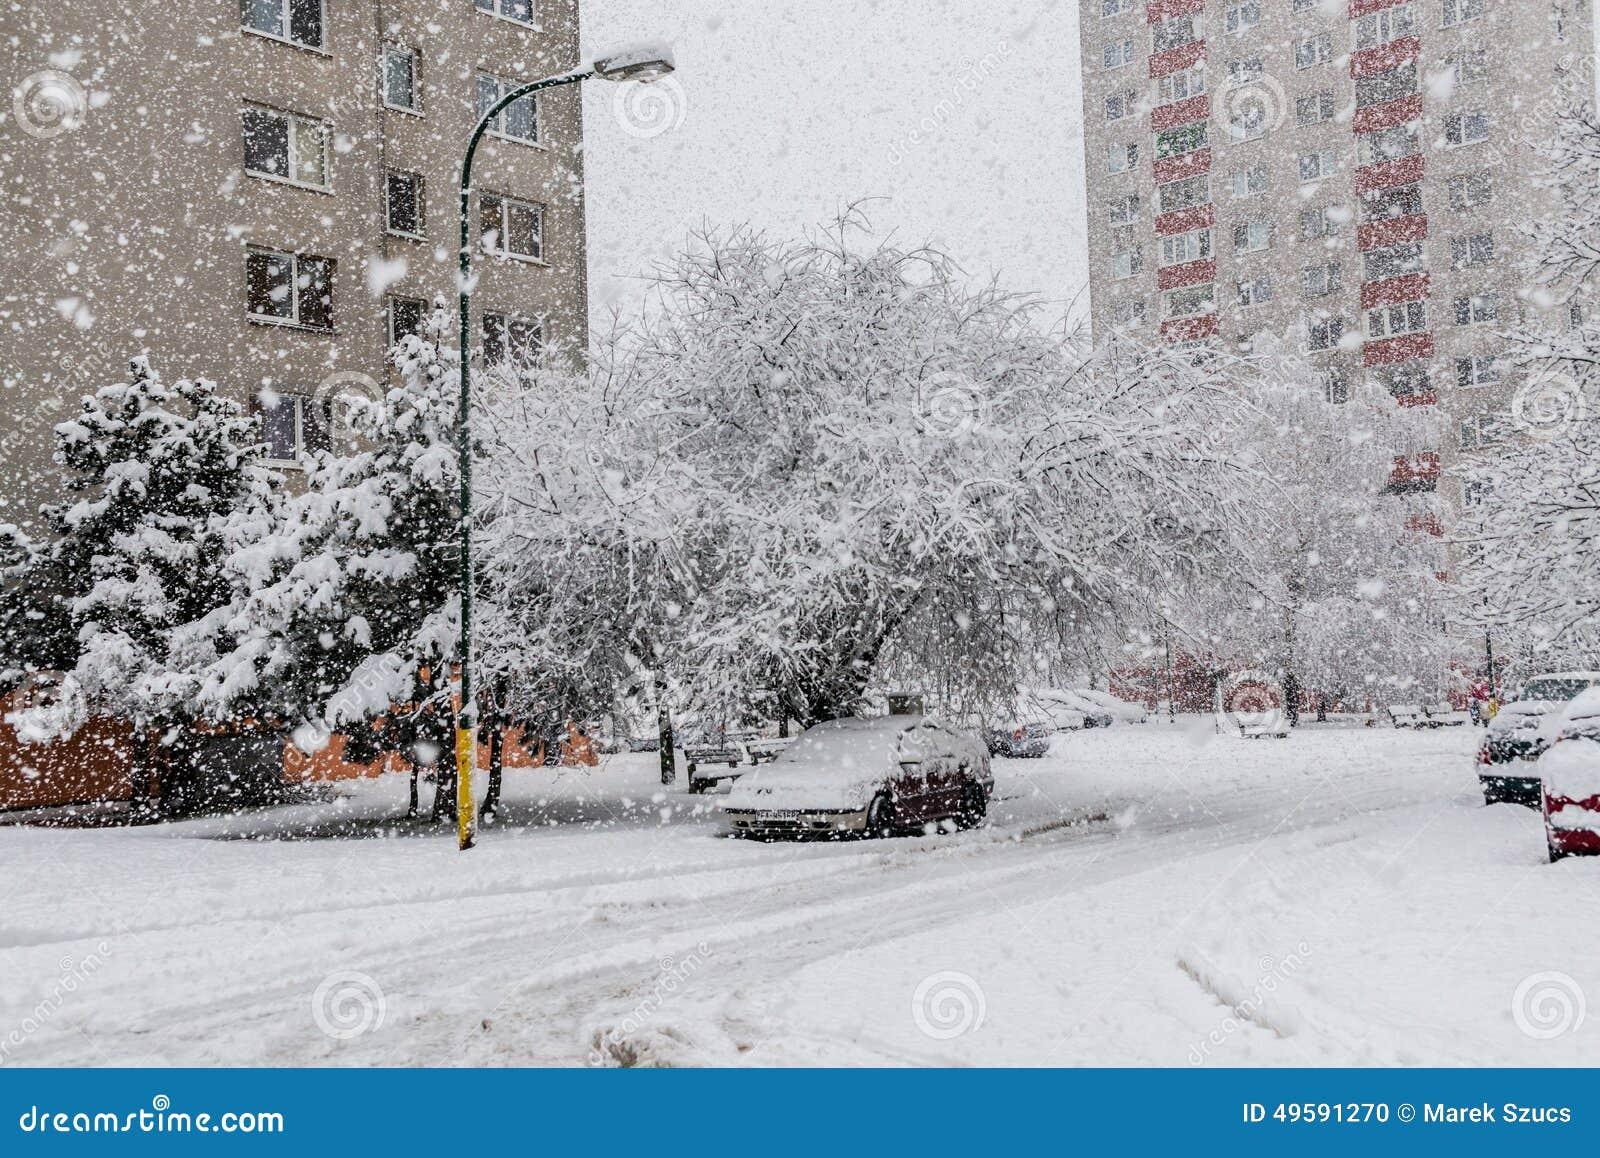 Schneeunglück in Bratislava Slowakei, enormer Schnee blättert ab 30. Januar 2015